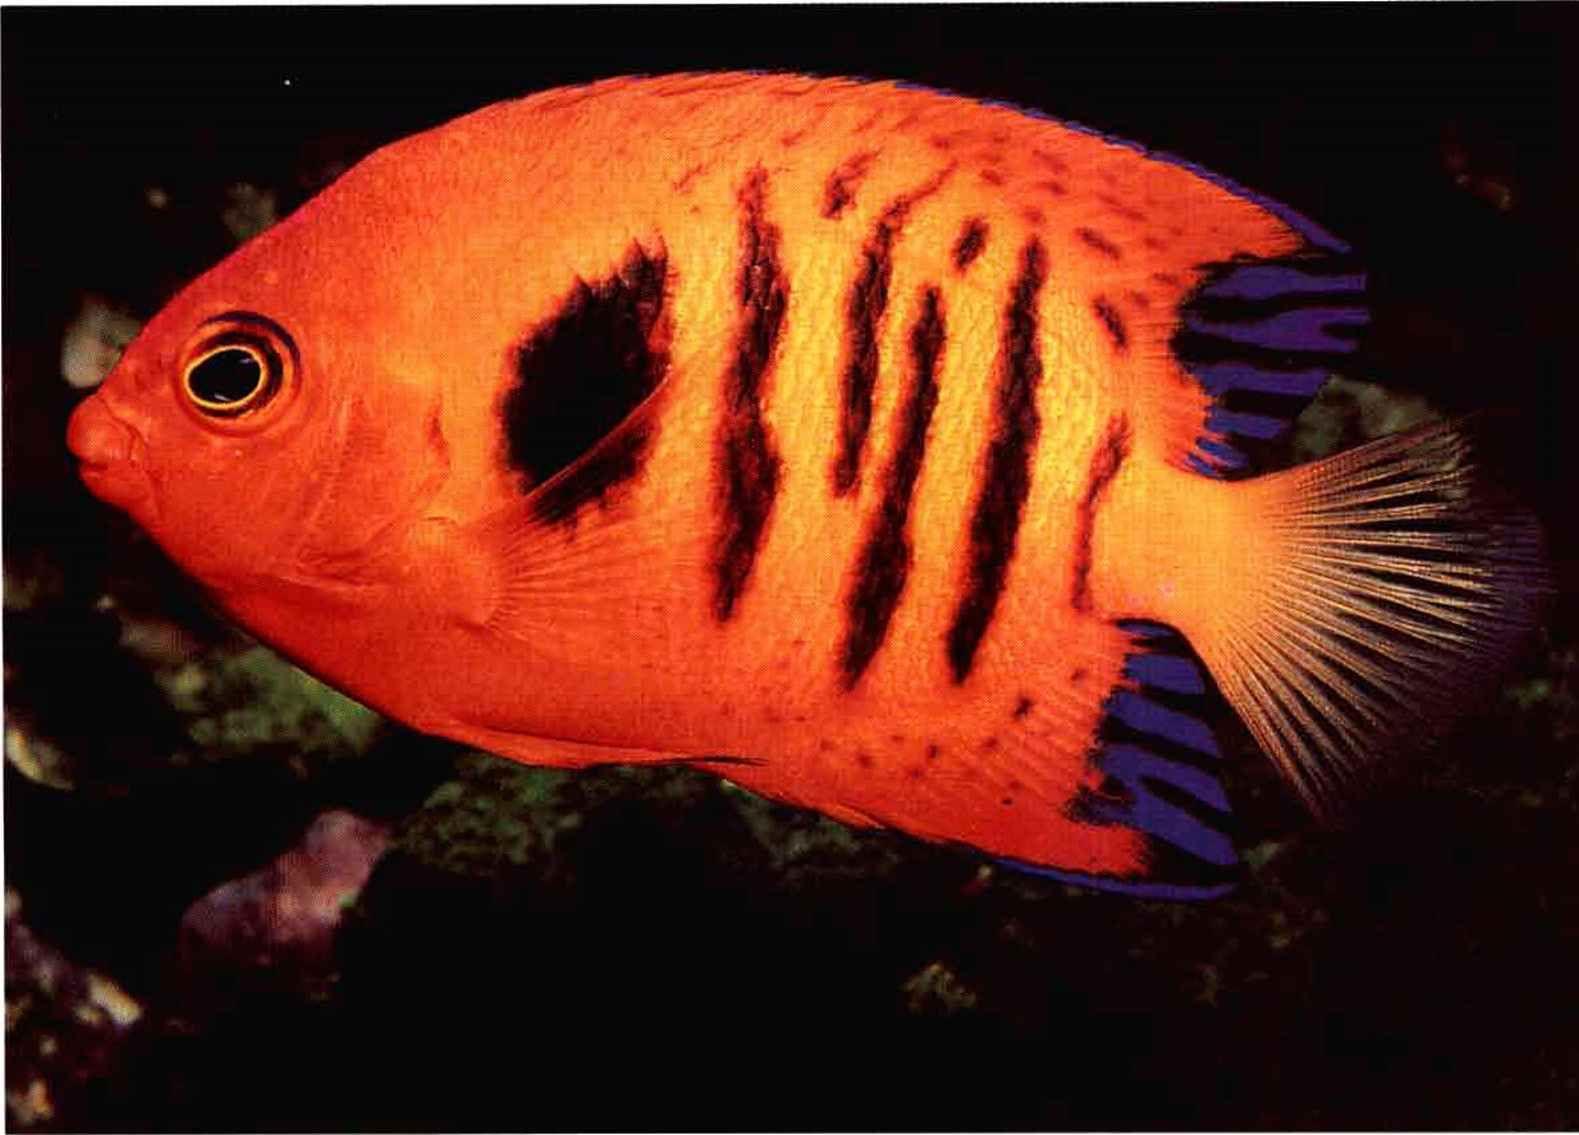 http://www.gibell.com/reef-aquariums/images/4272_118_455-tang-fish ...